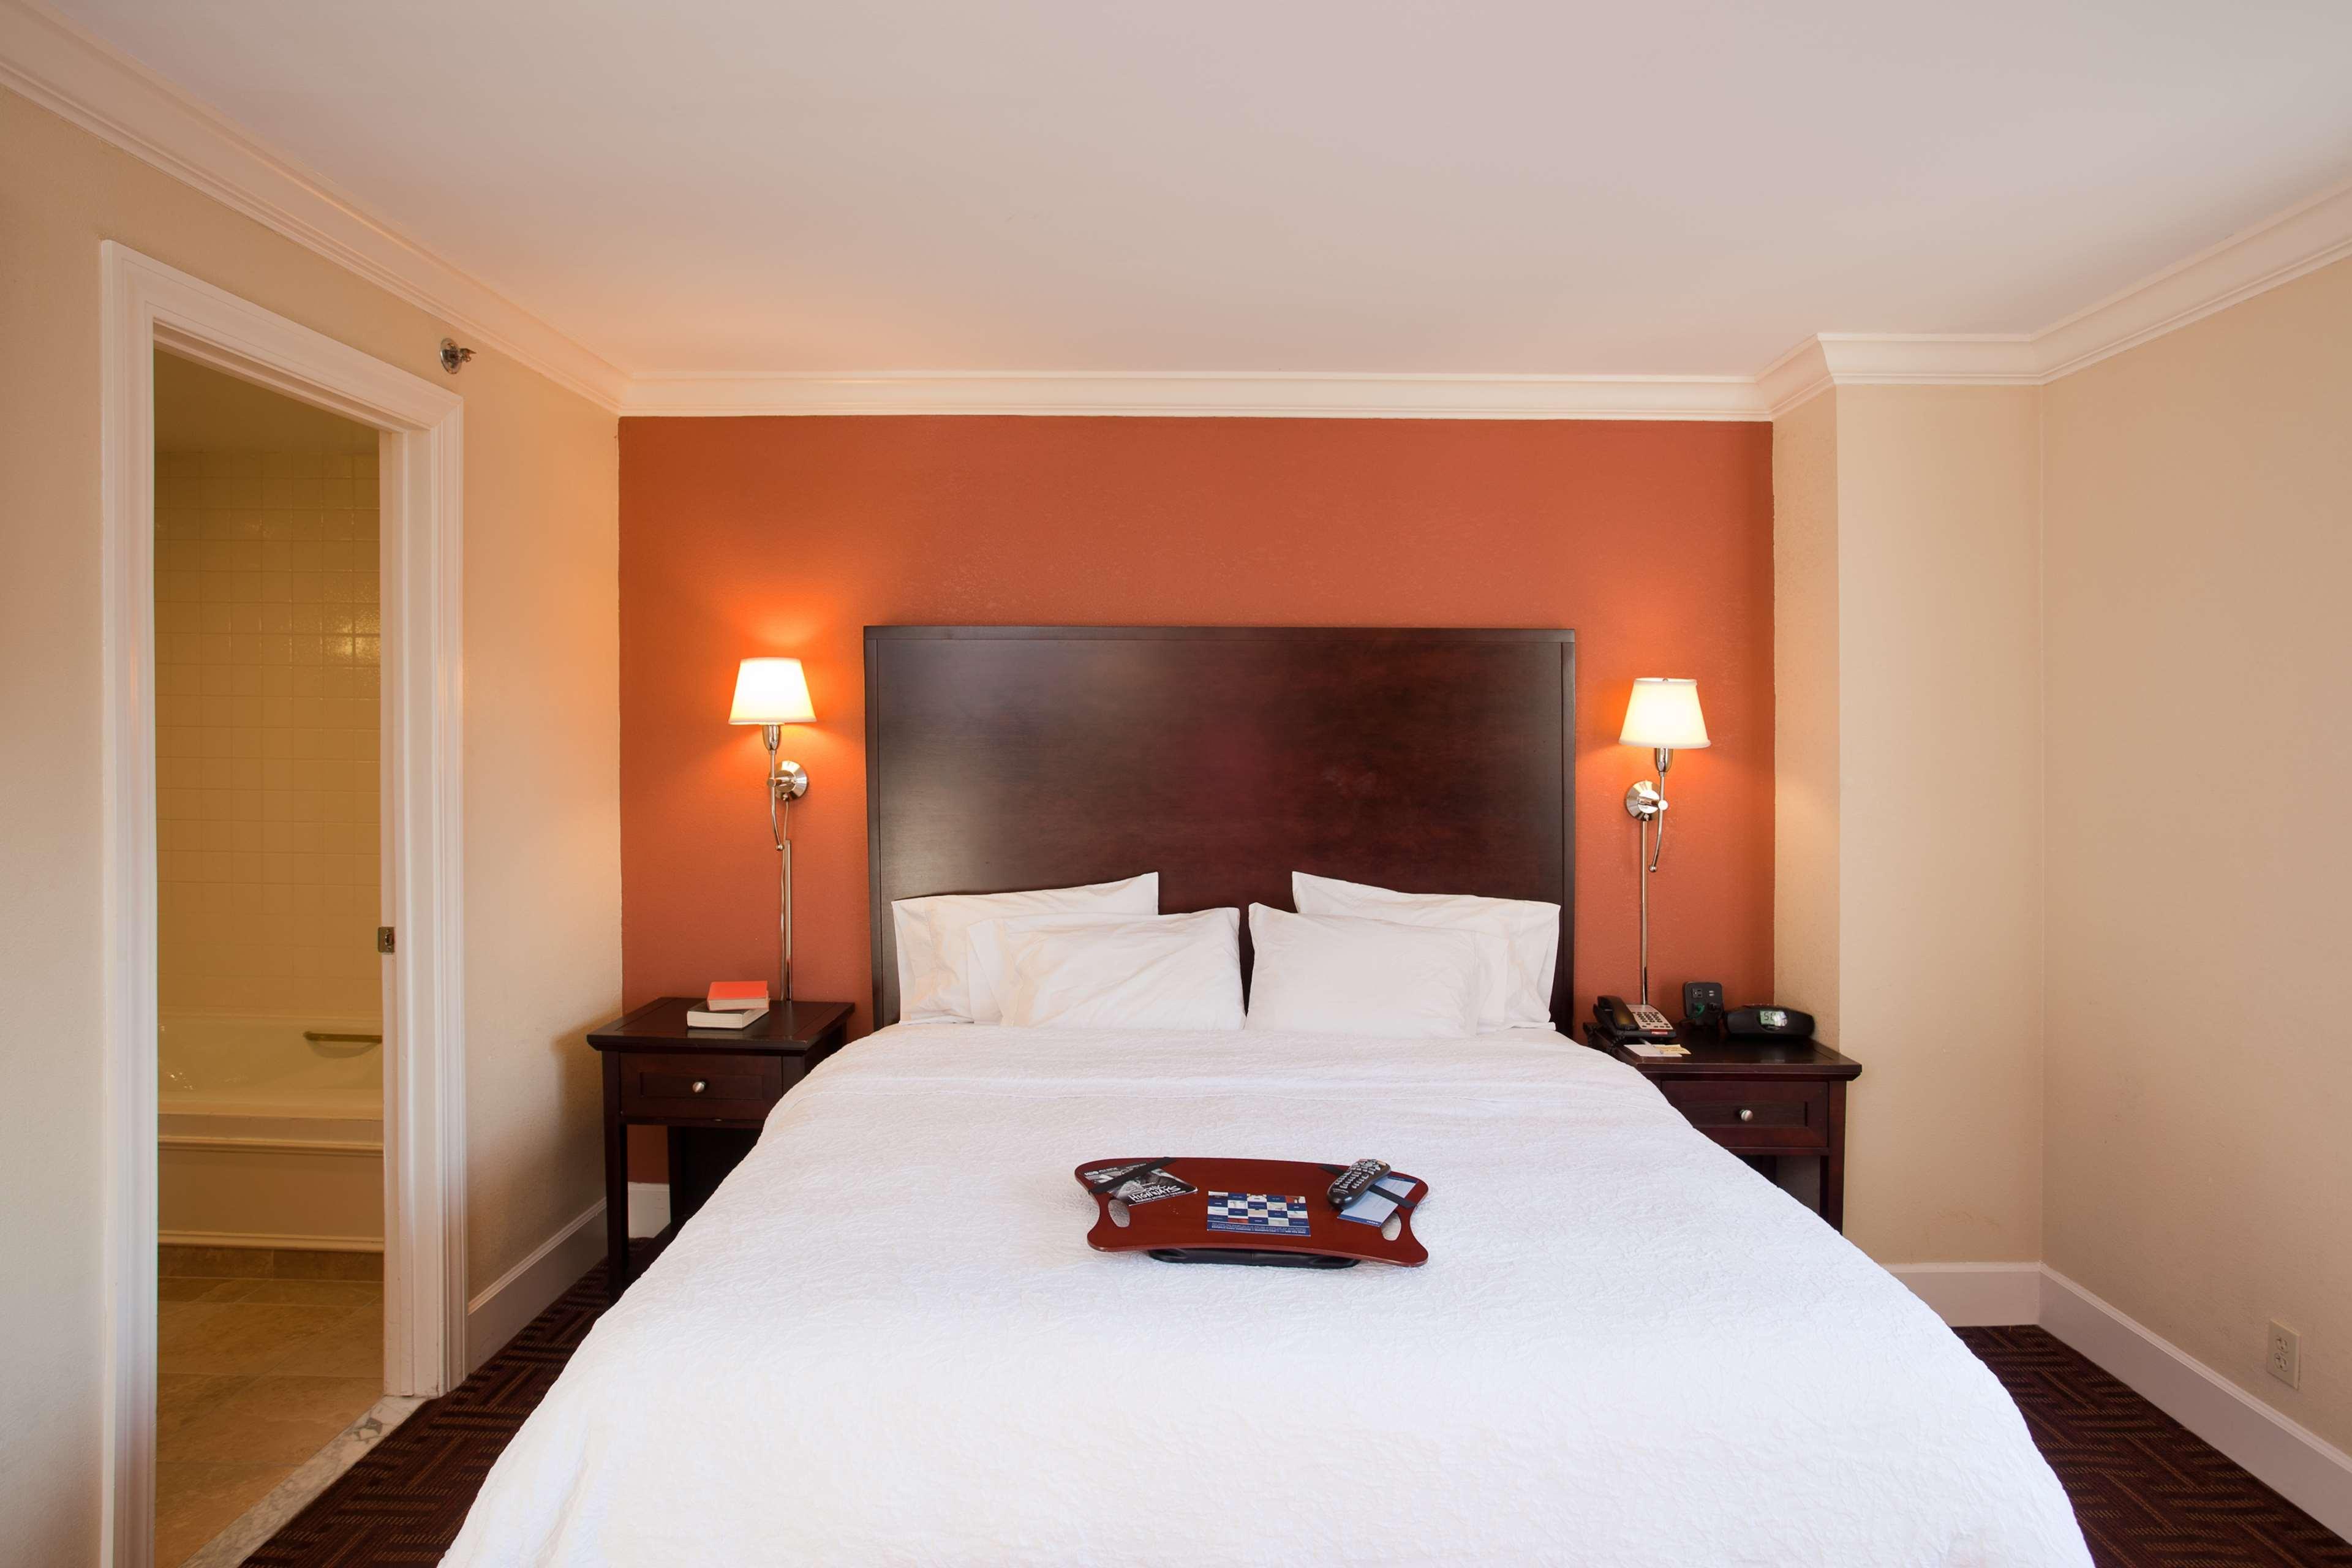 Hampton Inn & Suites Stamford image 34